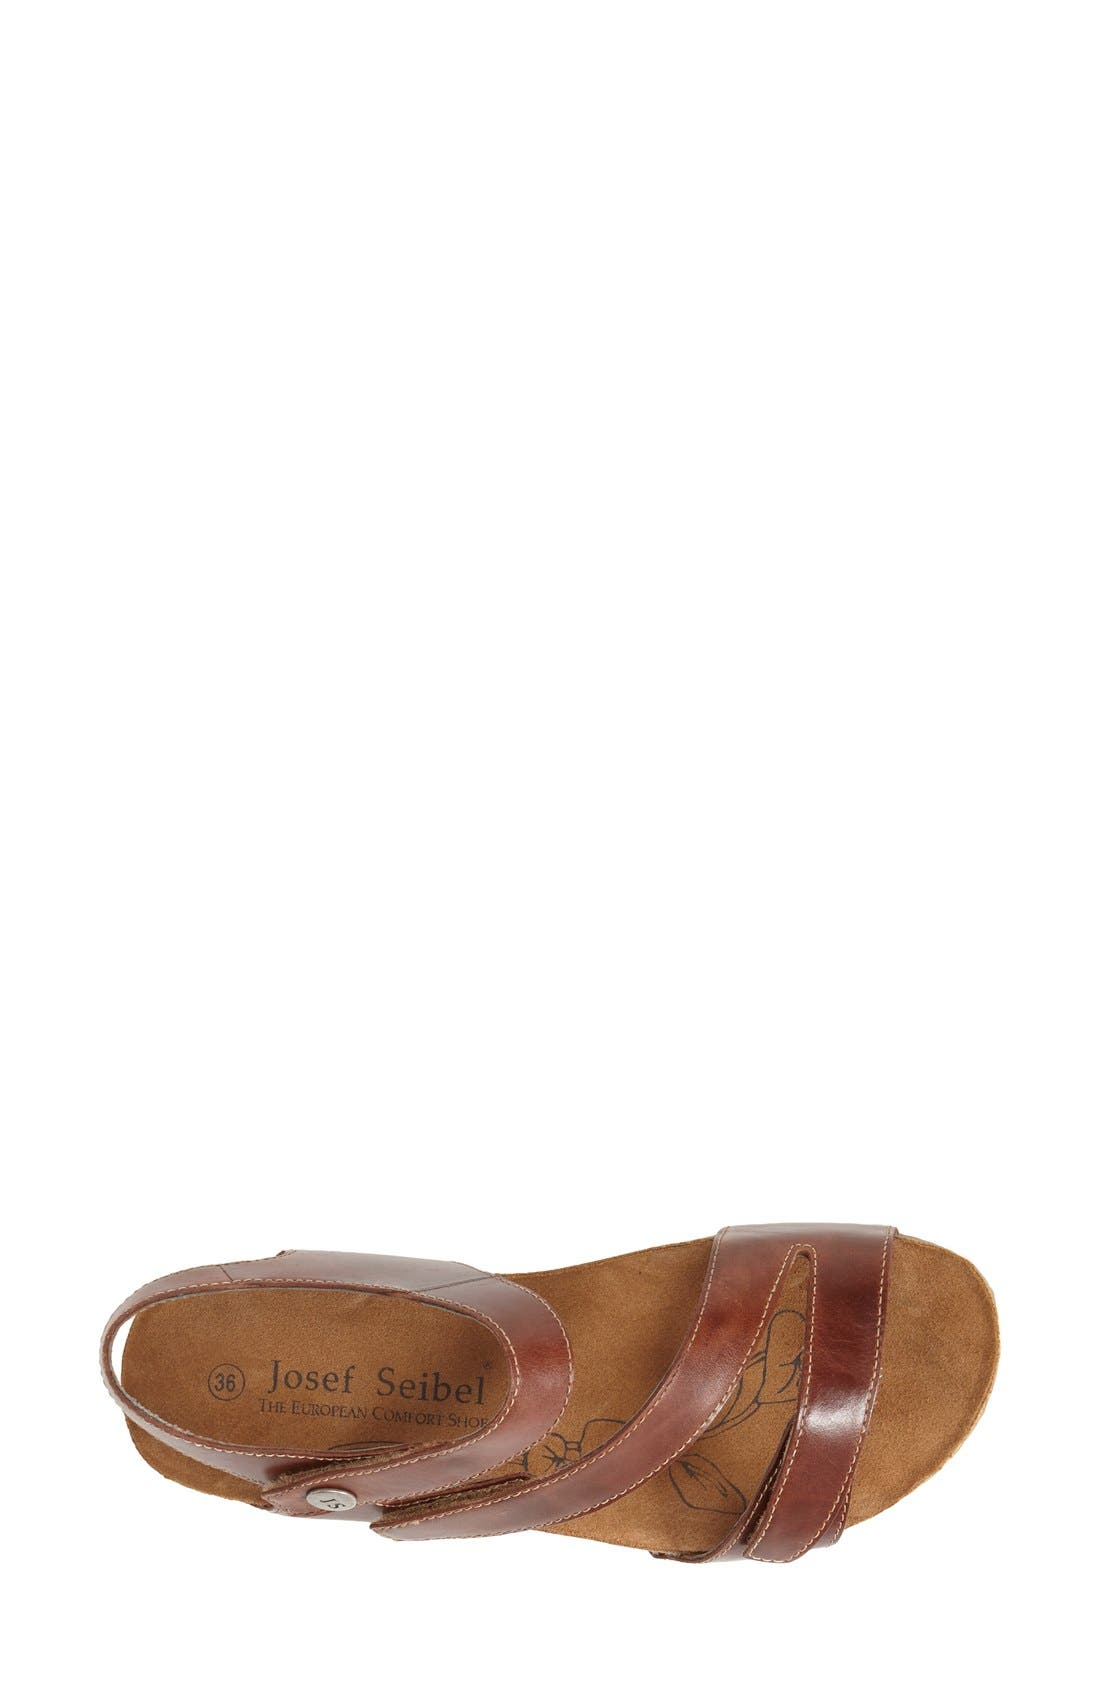 Alternate Image 3  - Josef Seibel 'Tonga' Leather Sandal (Women)